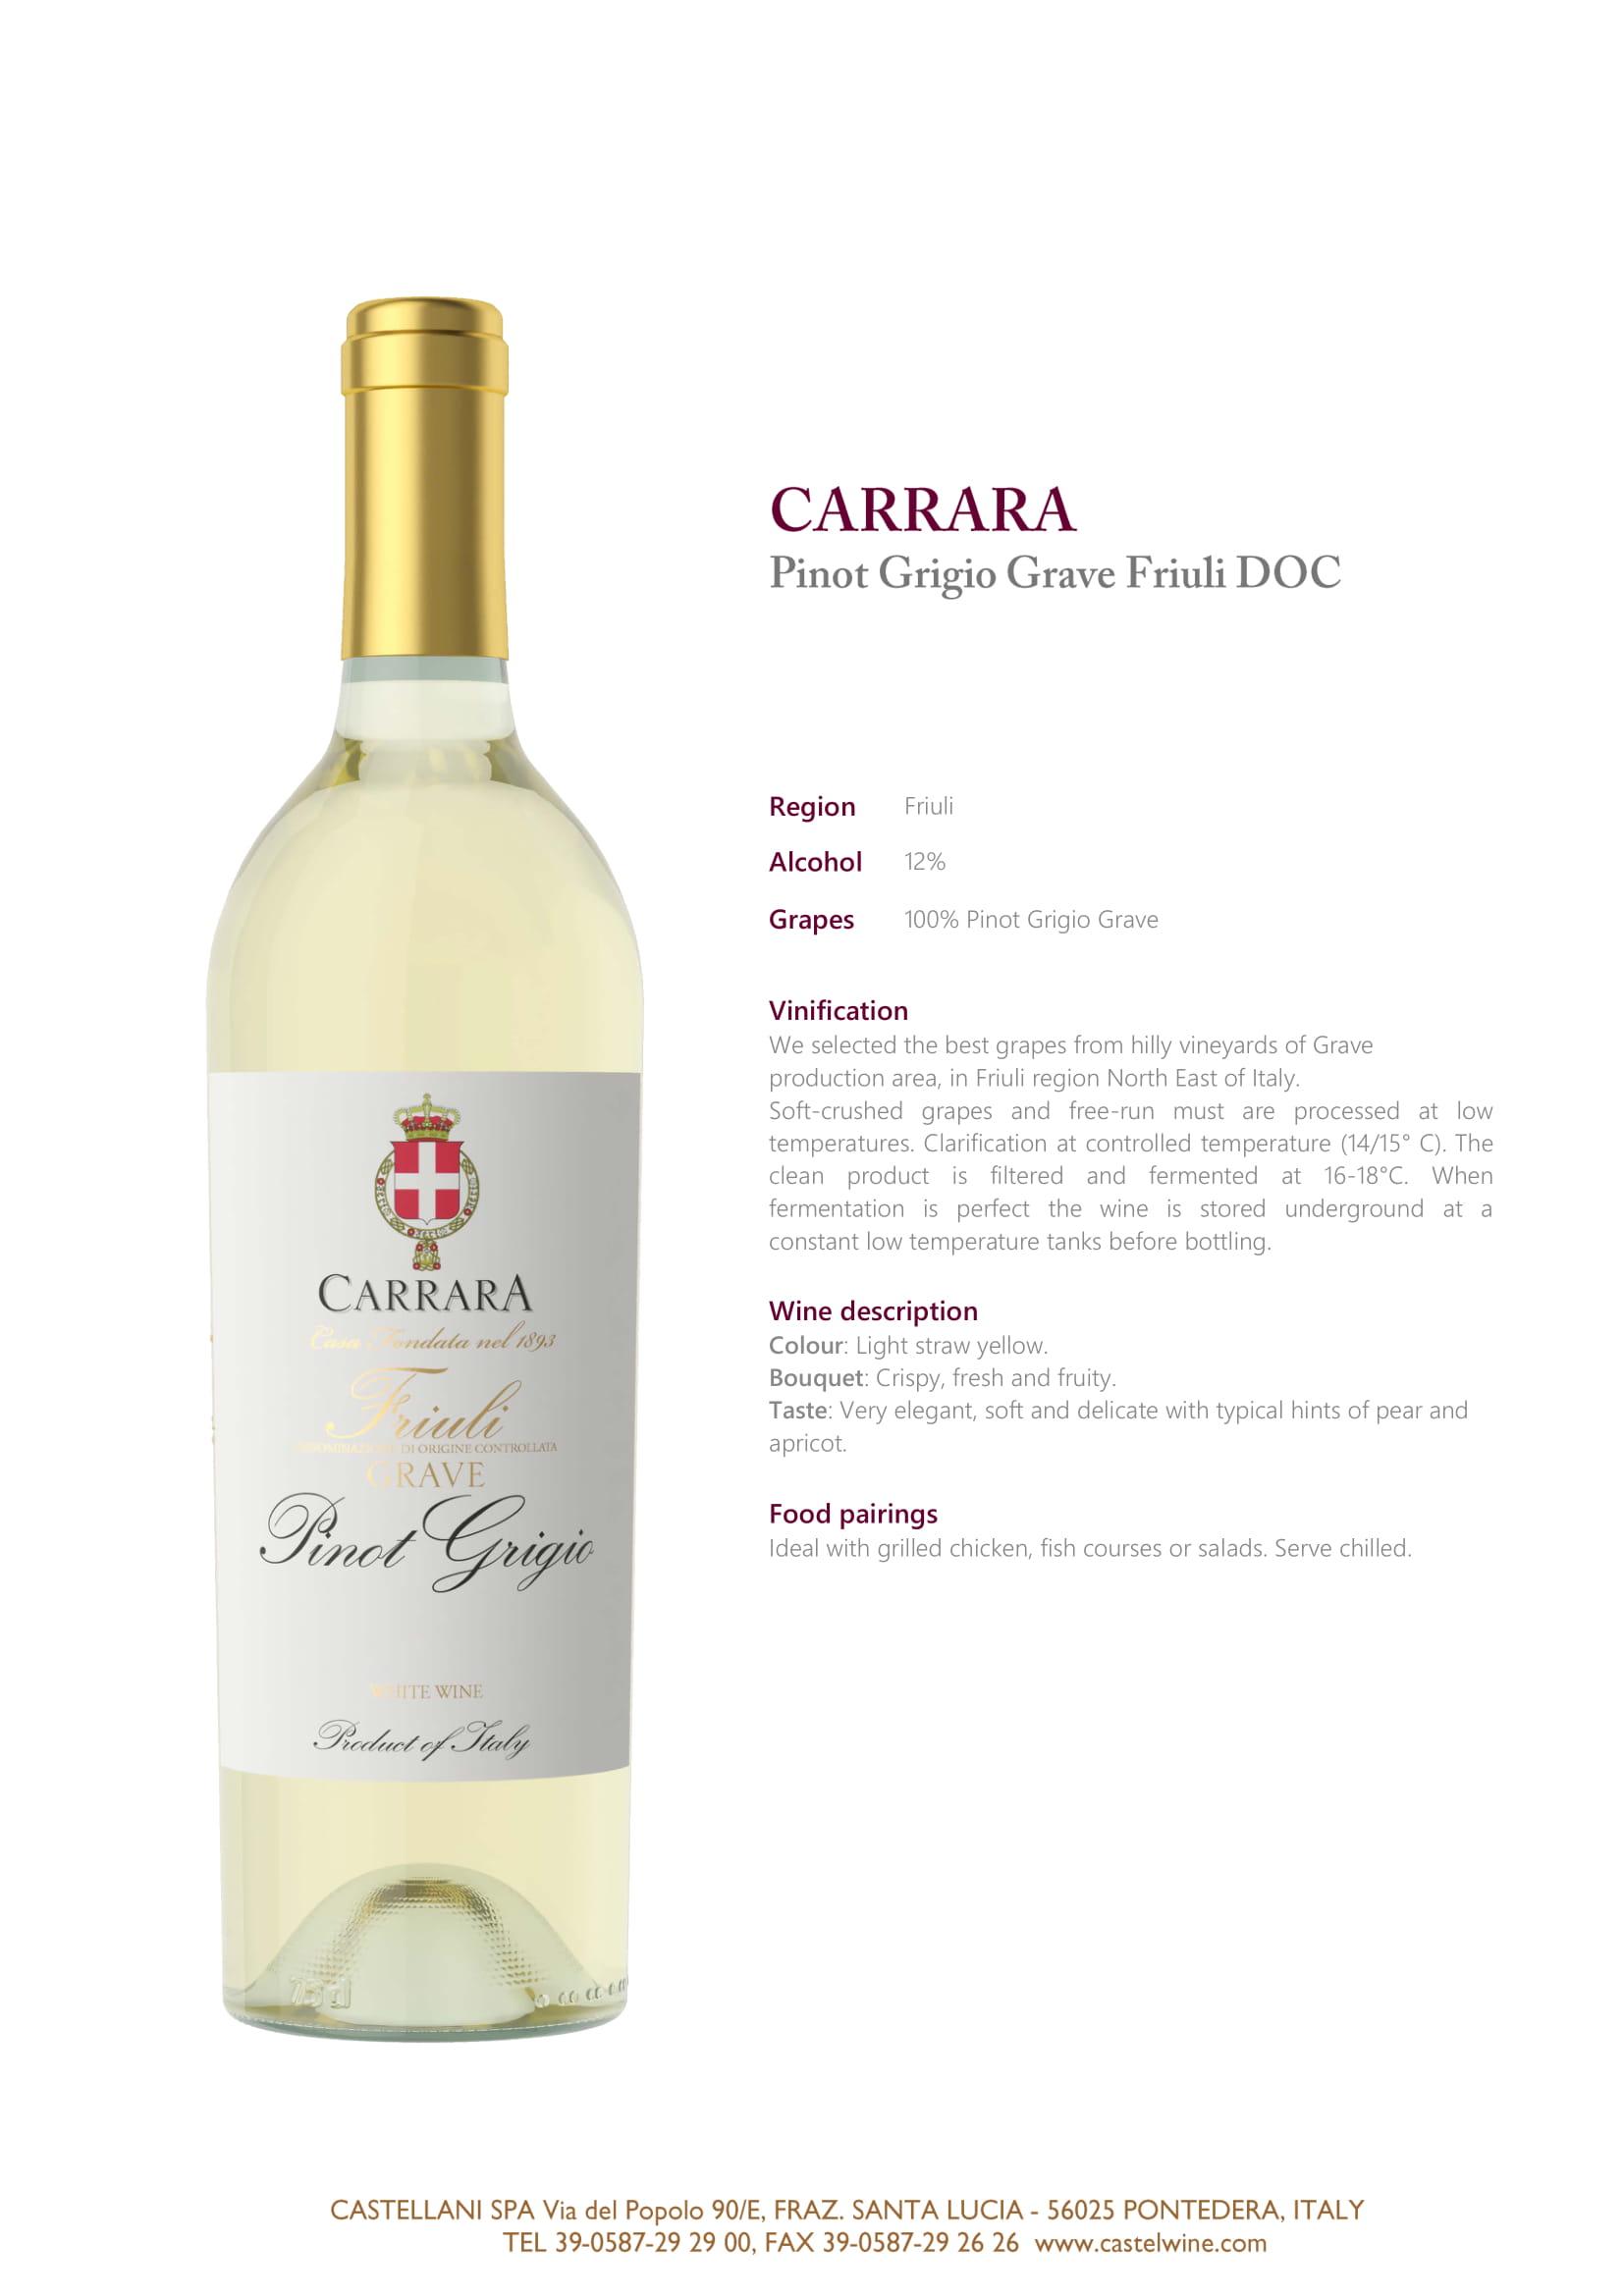 Carrara Pinot Grigio Tech Sheet